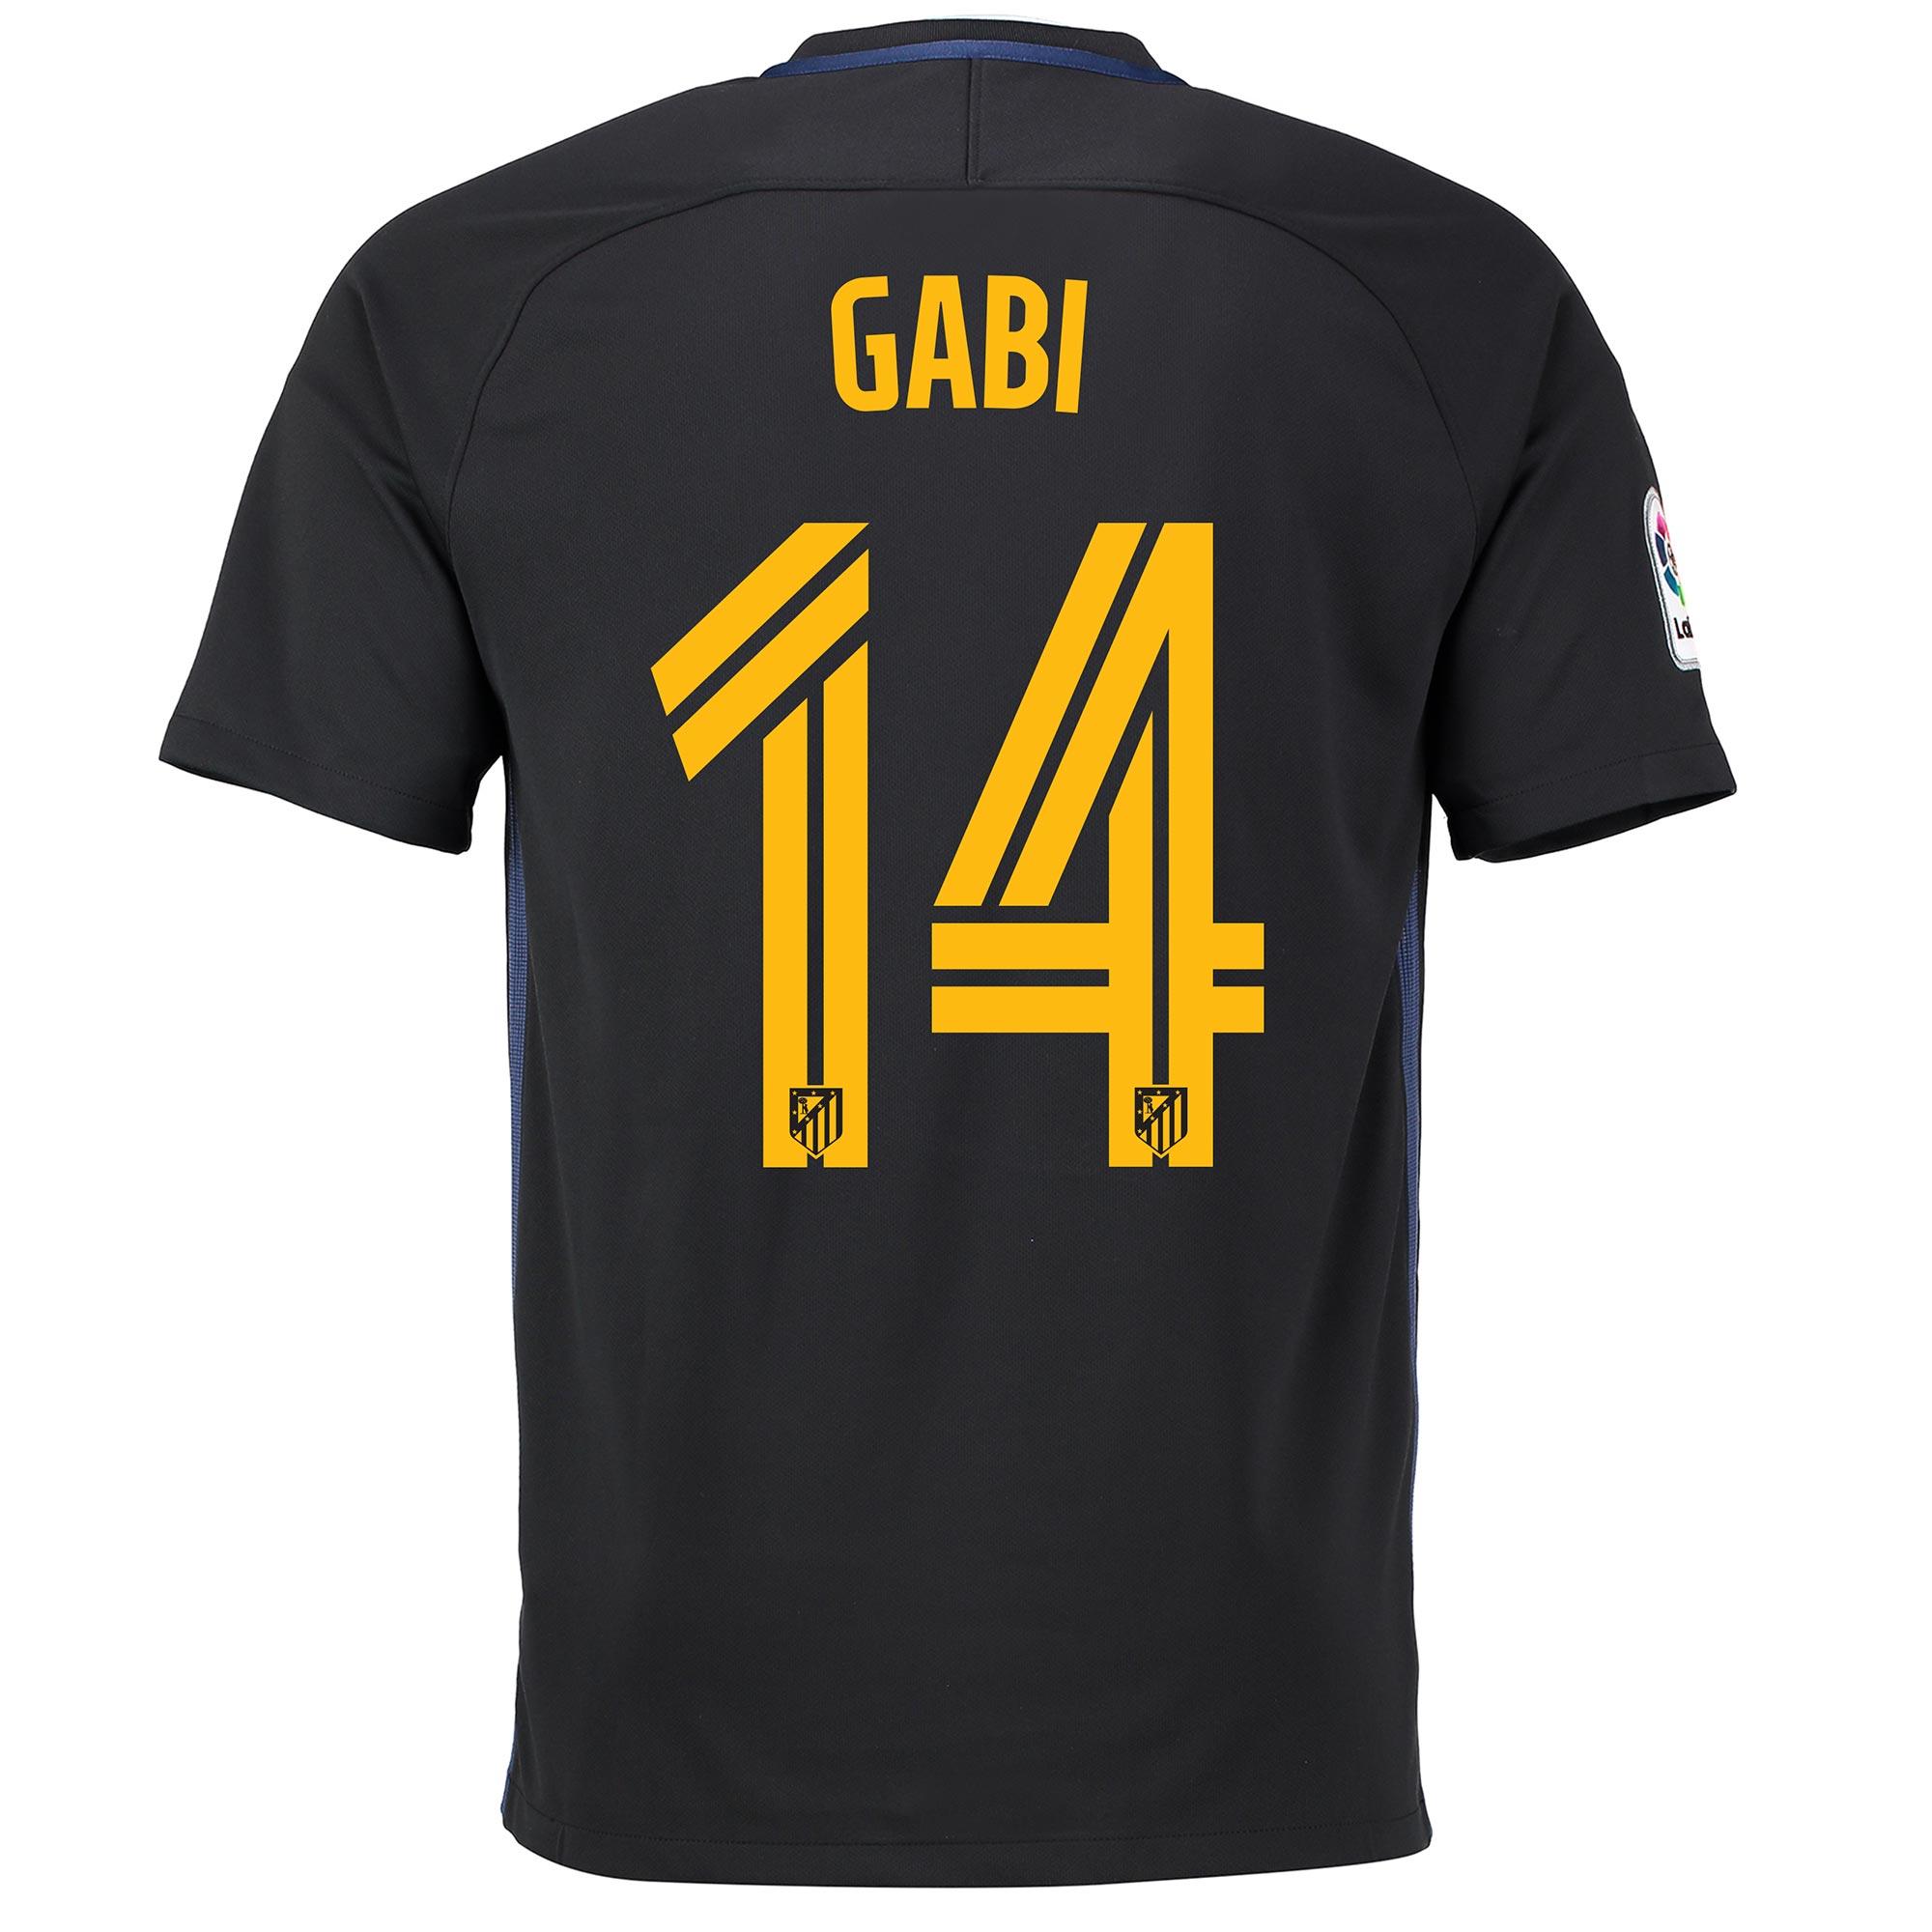 Image of Atletico Madrid Away Shirt 2016-17 with Gabi 14 printing, Black